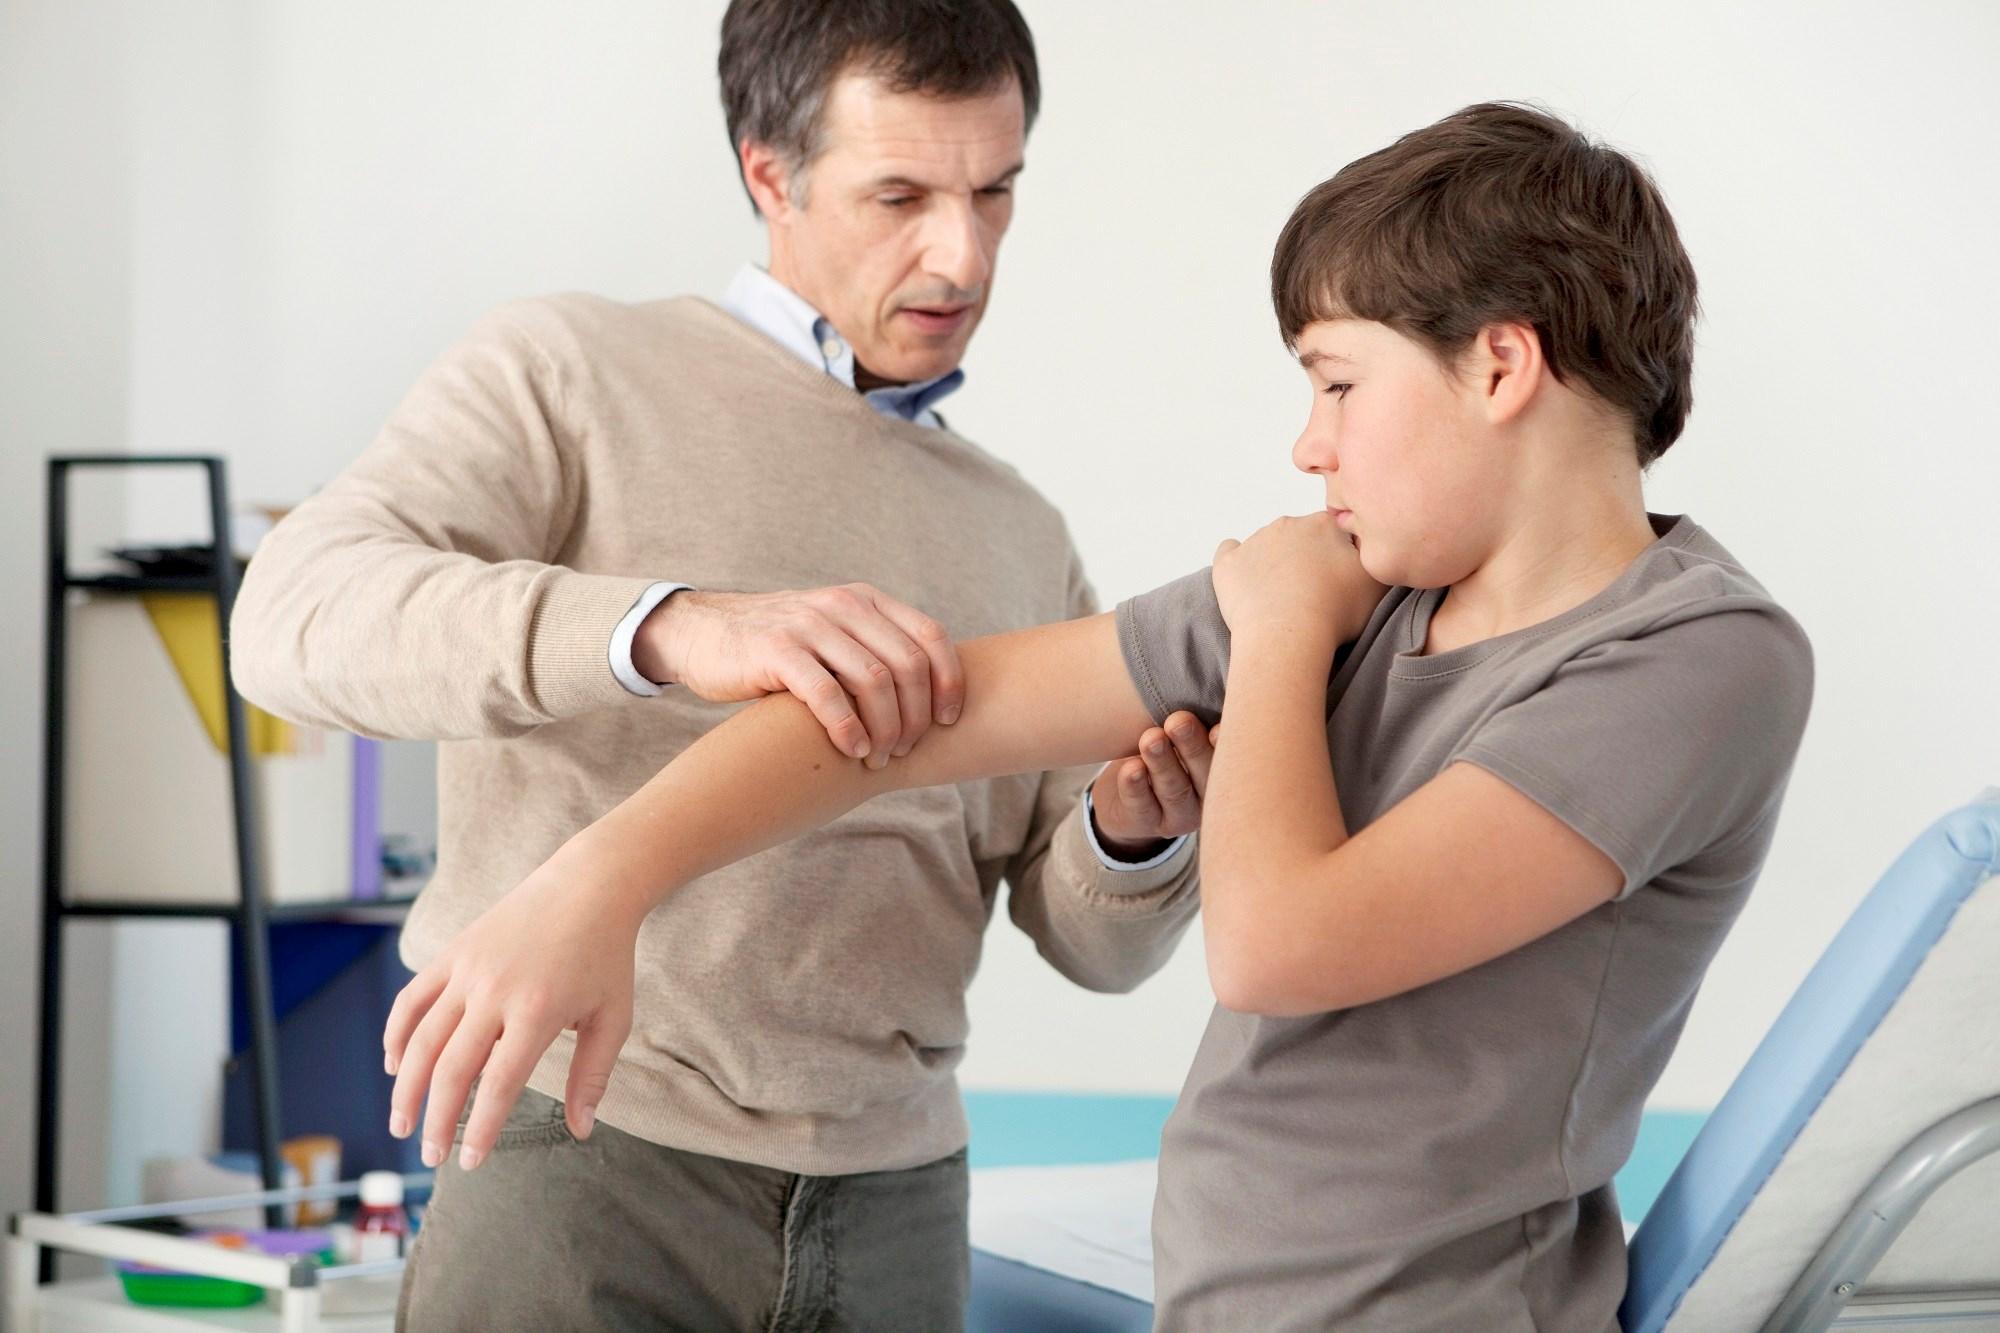 Evaluating Disease Activity Outcome Variables in Juvenile Dermatomyositis